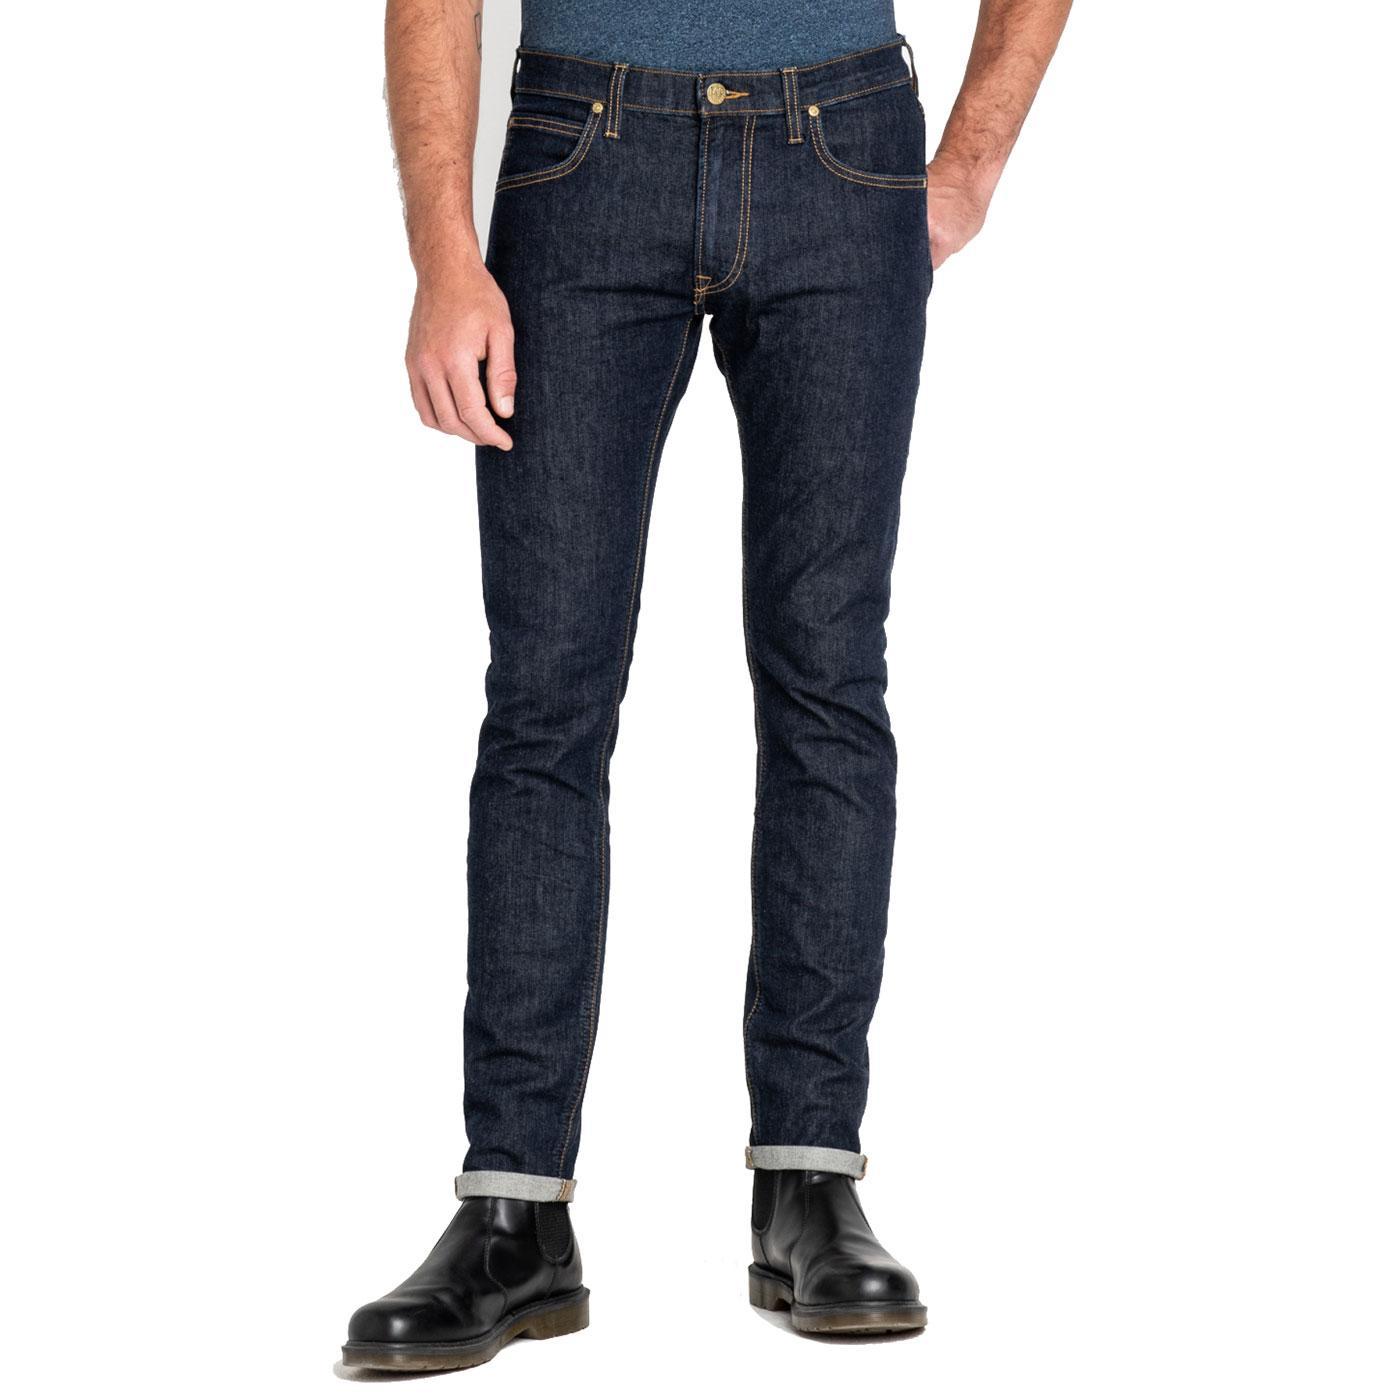 Luke LEE Slim Tapered Retro Mod Denim Jeans RINSE